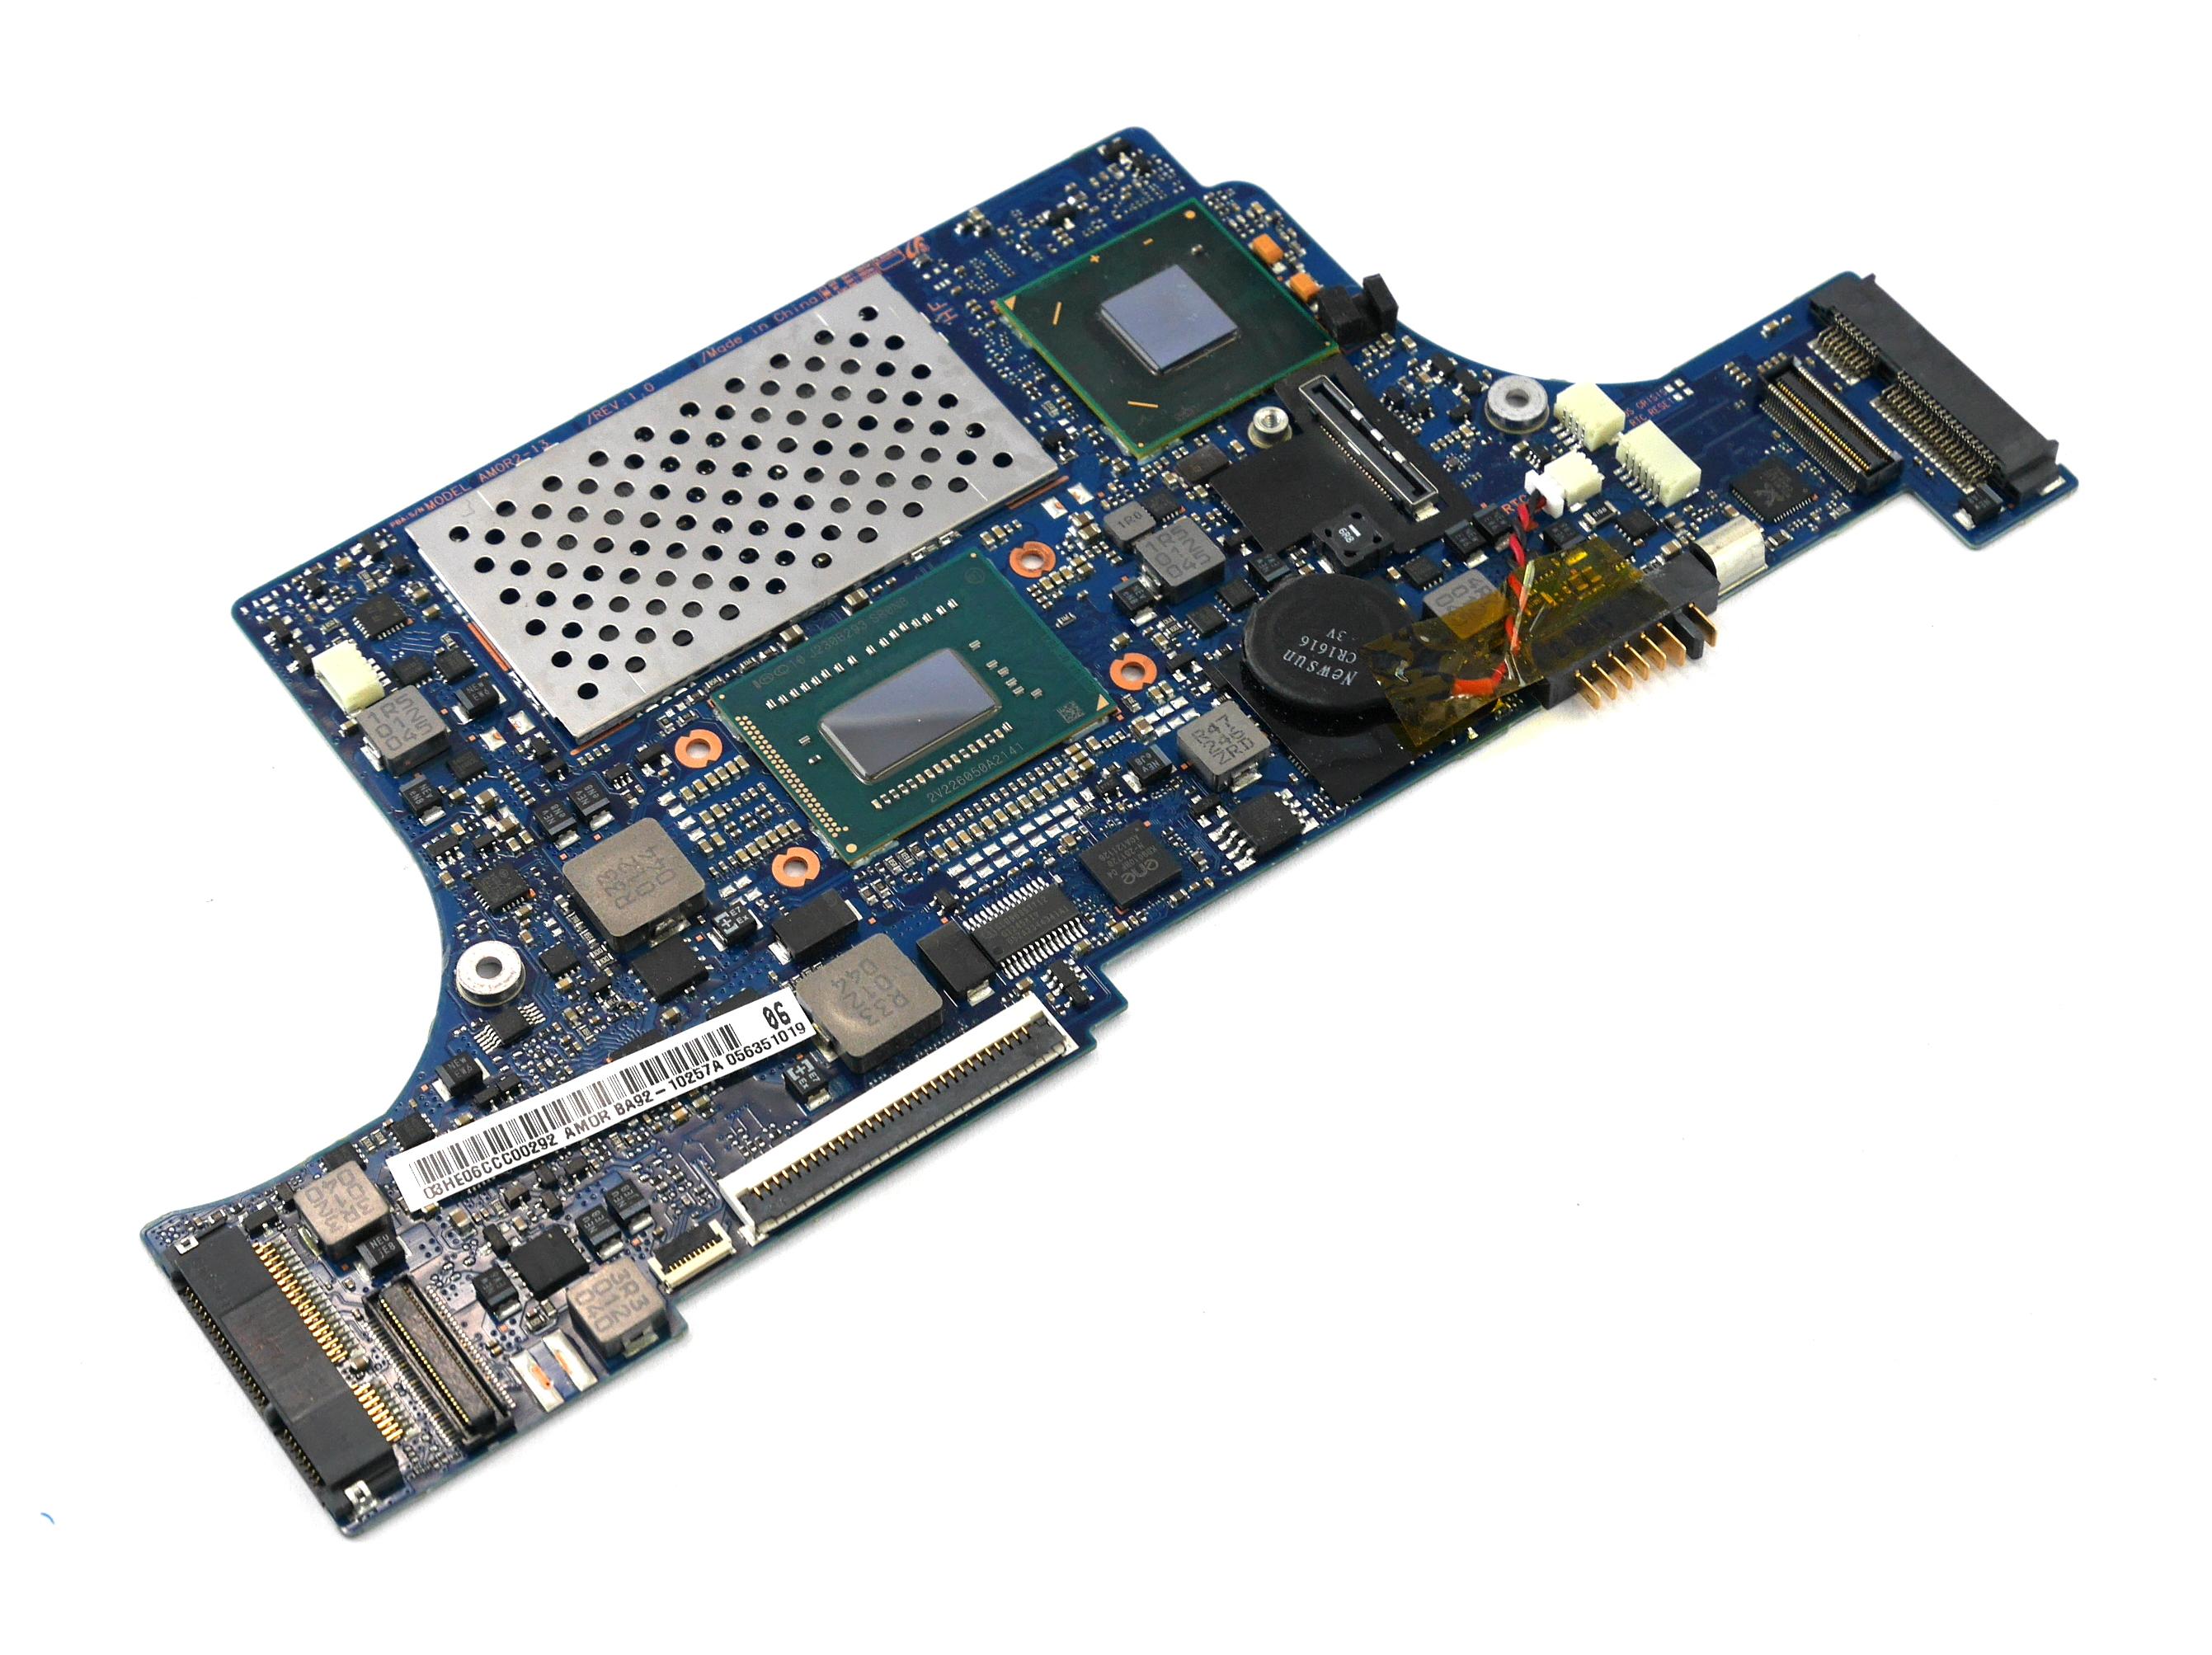 Samsung BA92-10257 900X NP900X3C-A07UK Motherboard with Intel Core i5-3317U CPU